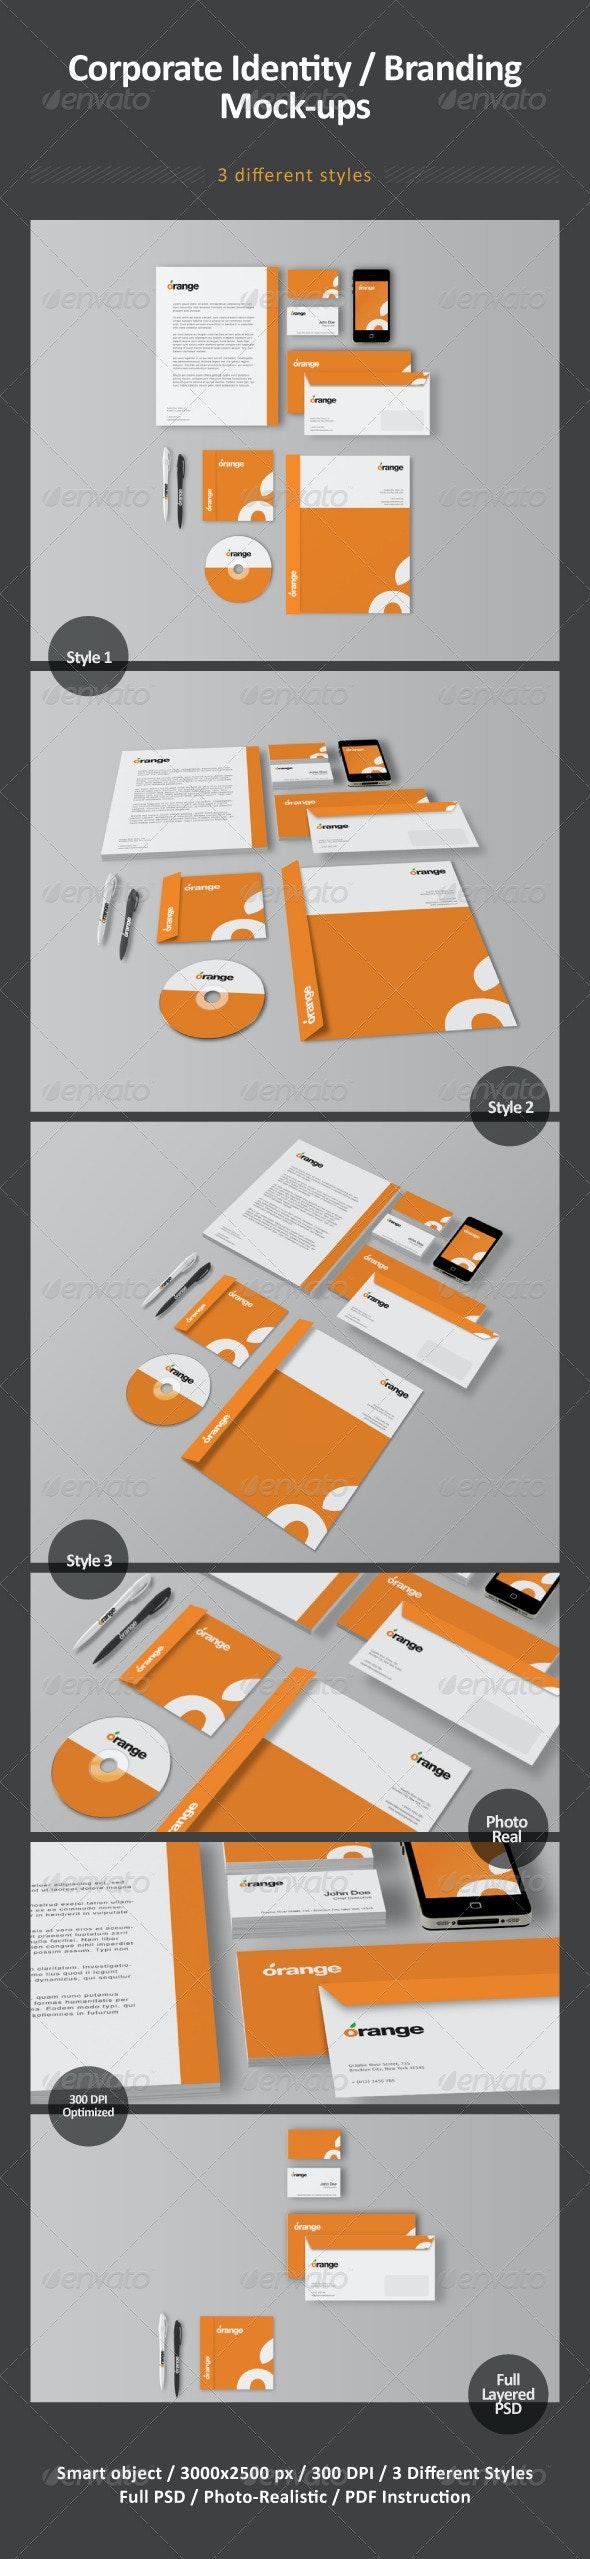 Corporate Identity / Branding Mock-ups - Stationery Print